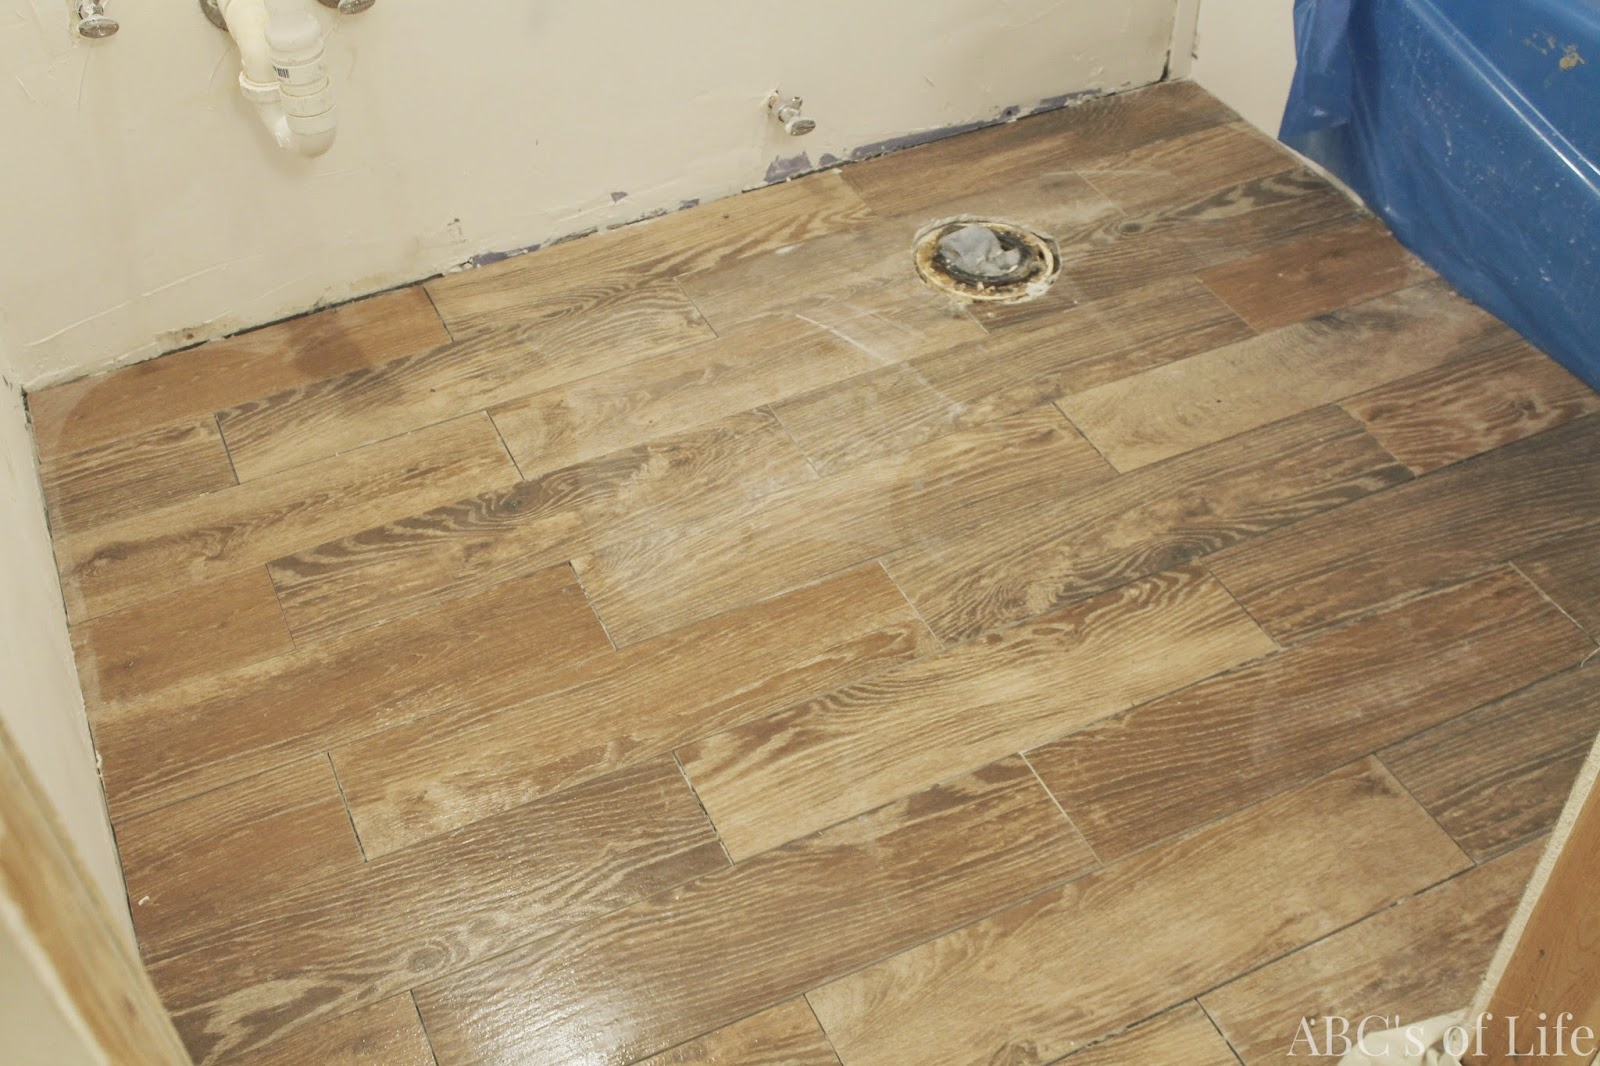 How to clean bathroom tile floor grout wood floors for How to clean bathroom tile floor grout